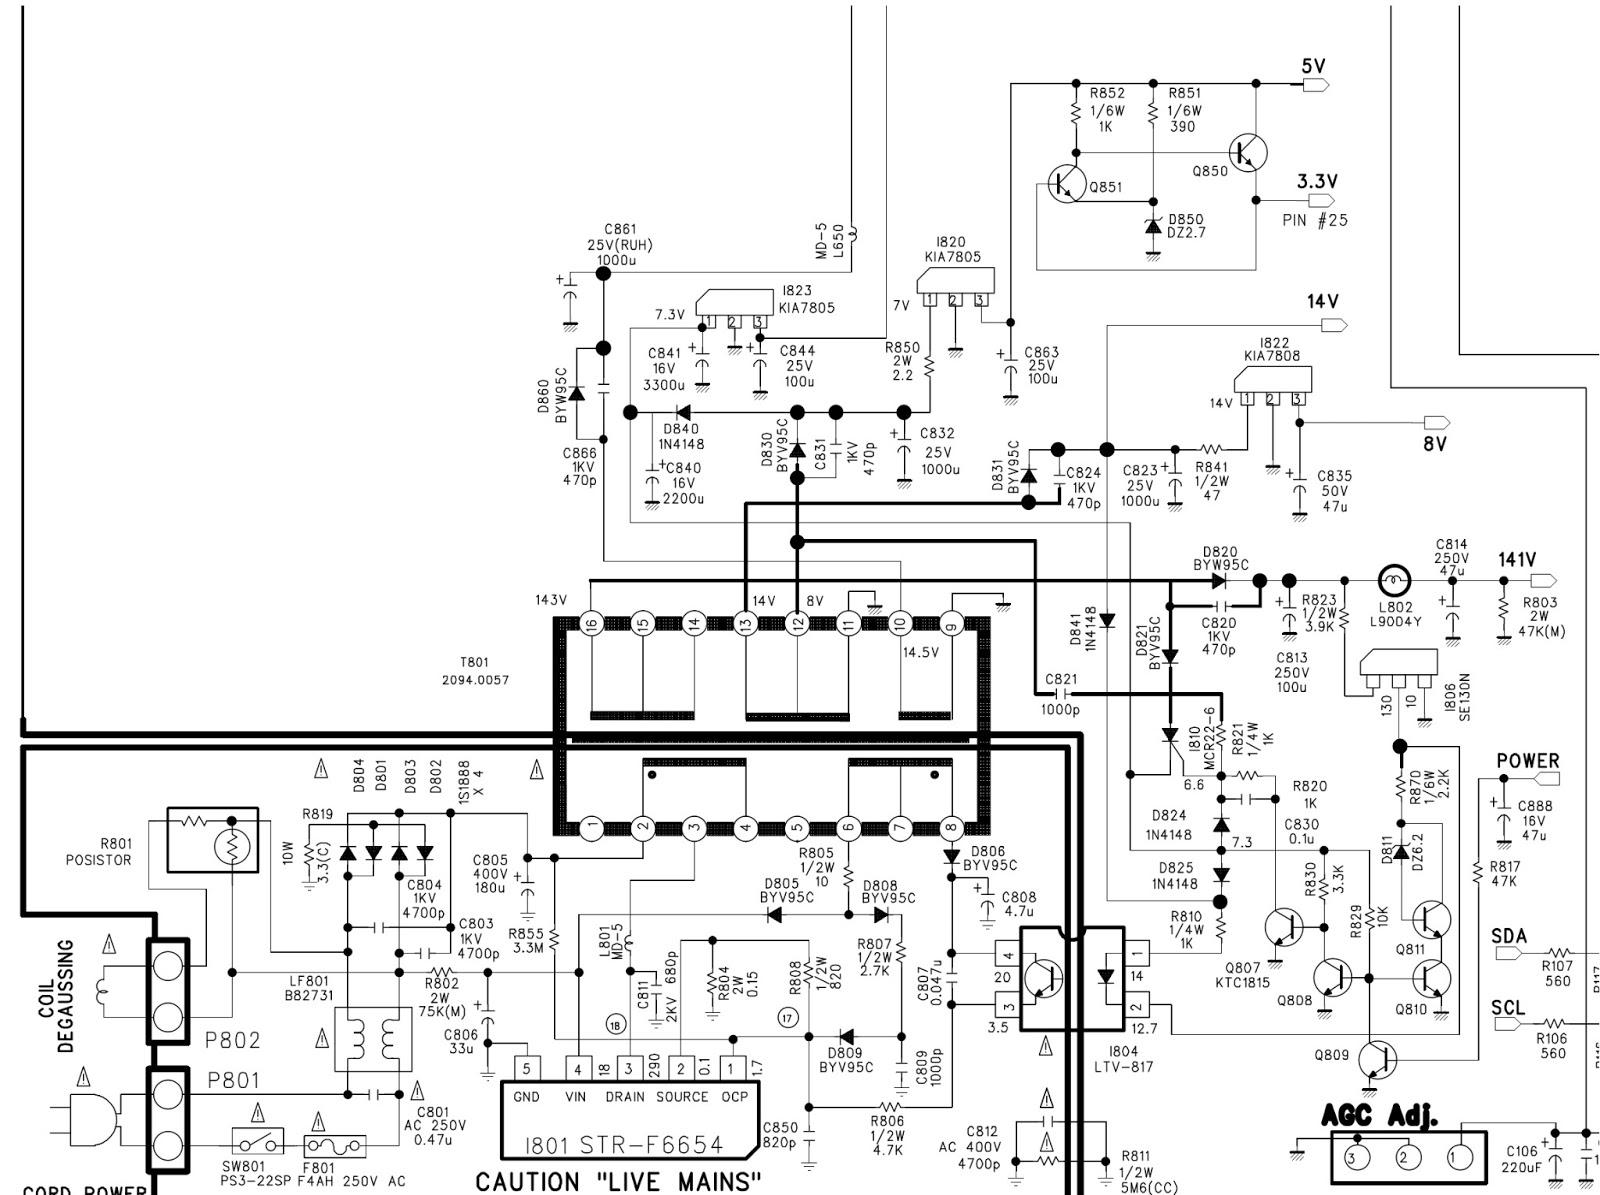 foil side on main board power section